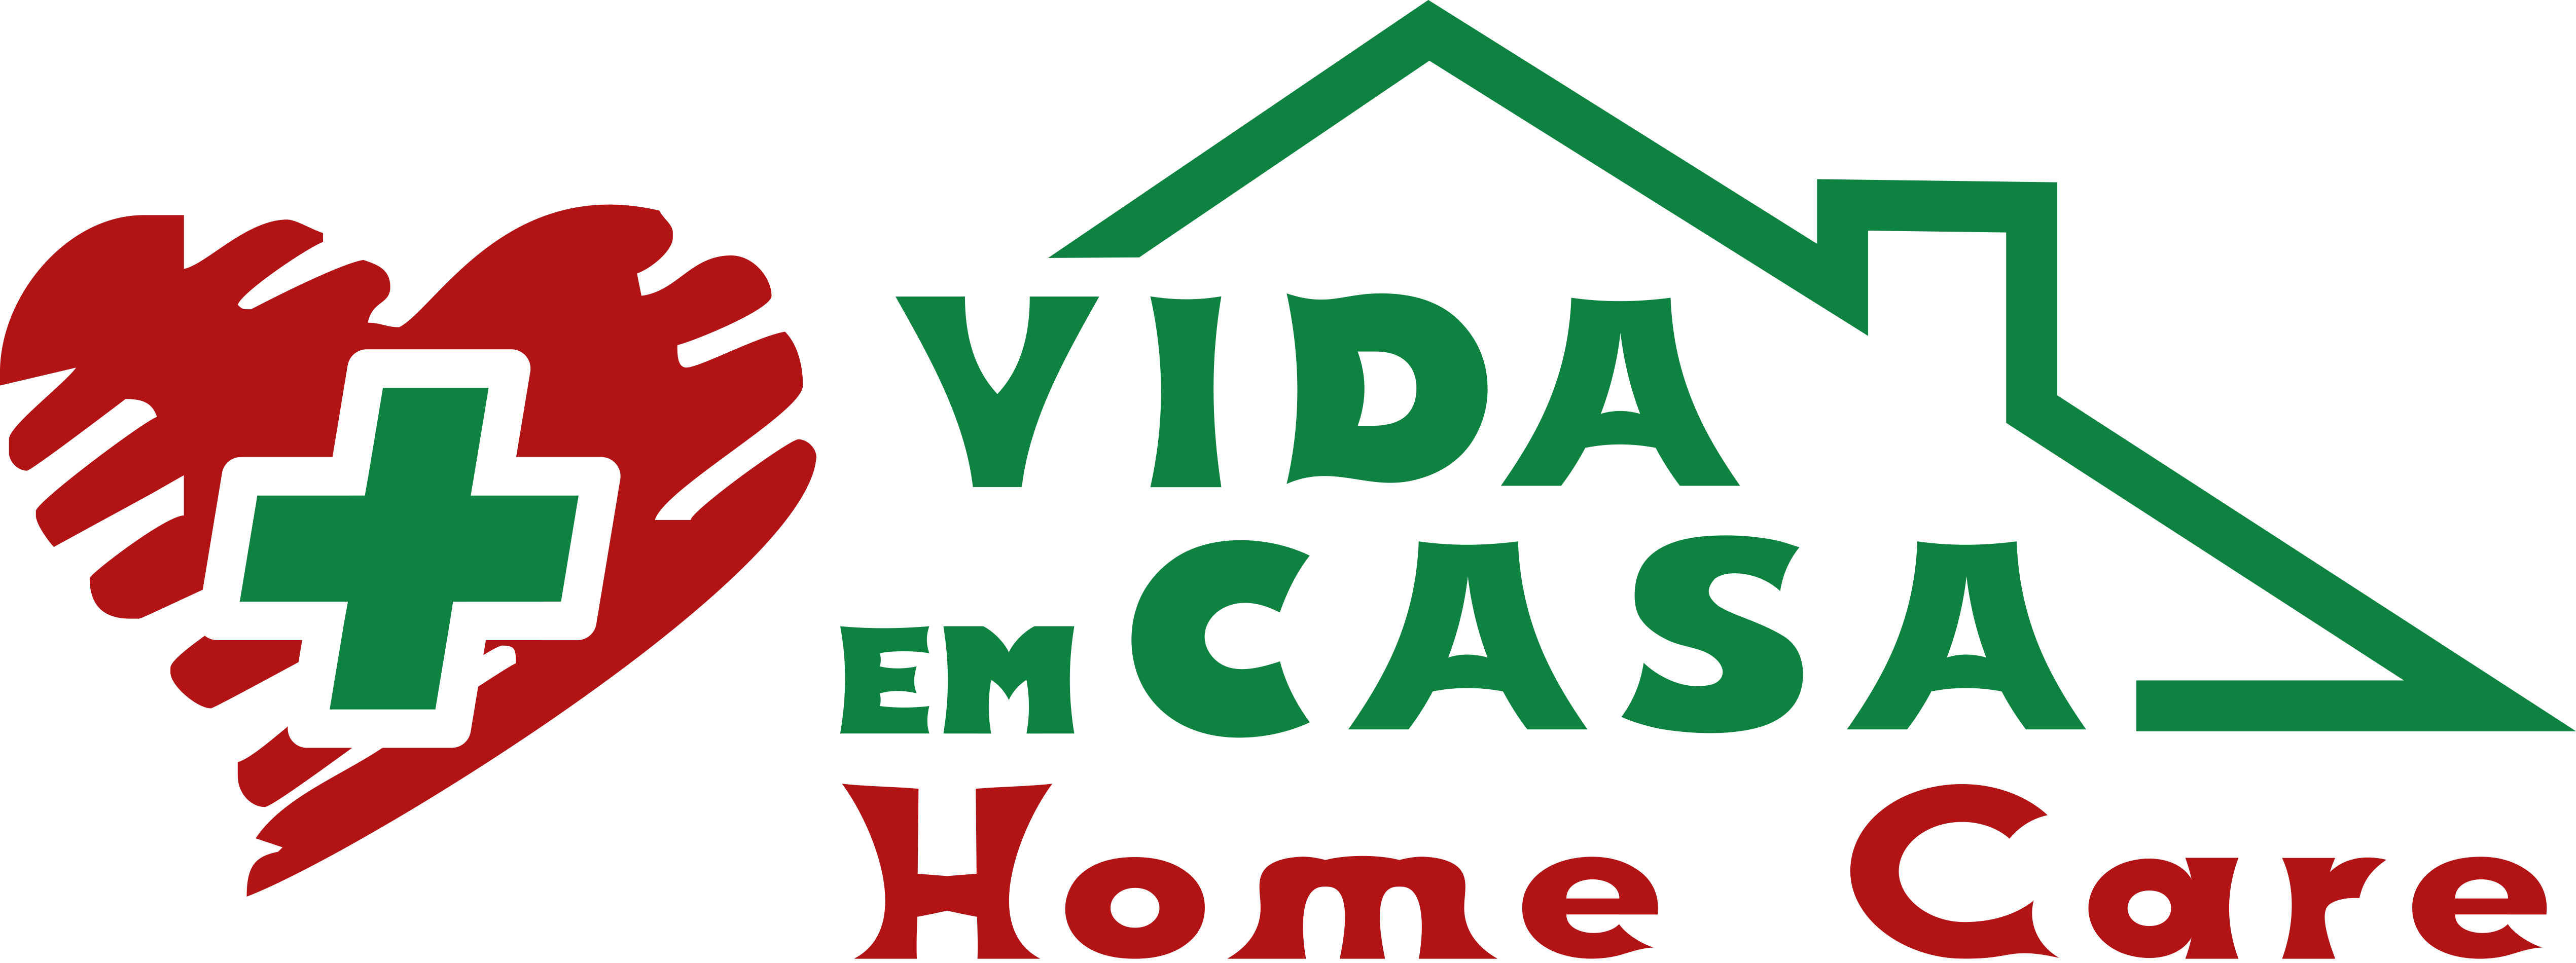 Logomarca   vida em casa